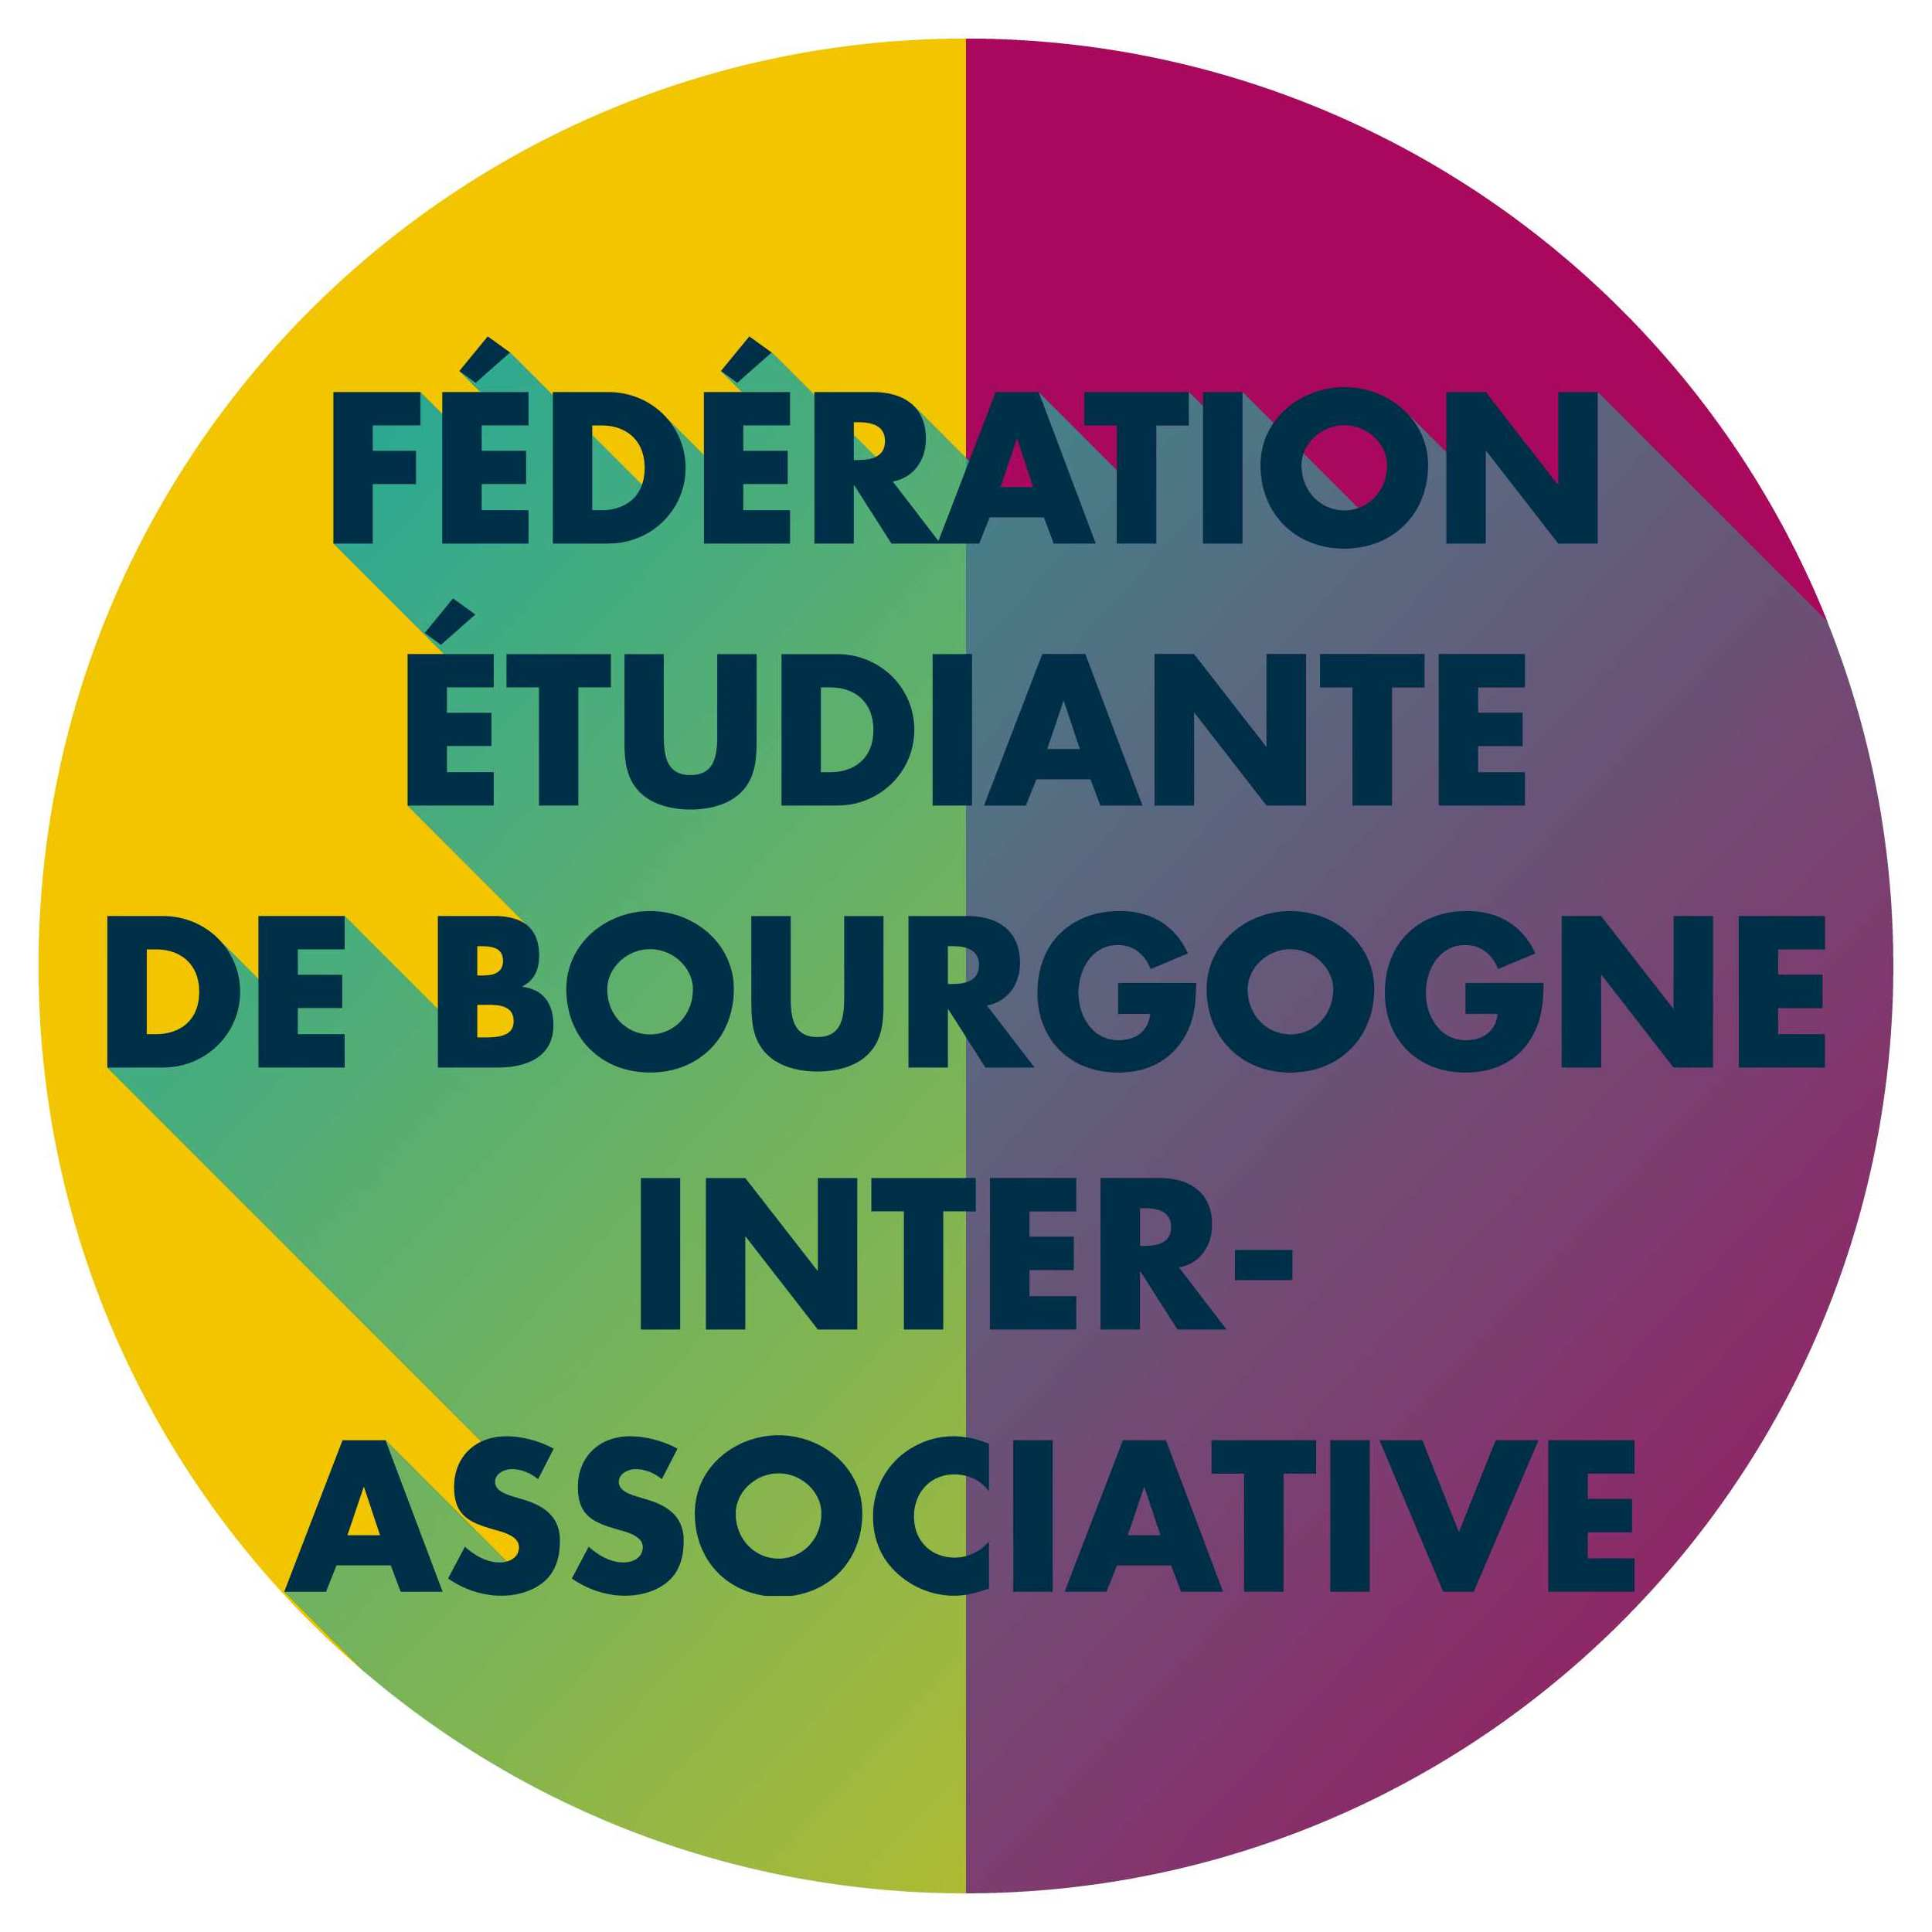 FÉDÉRATION ÉTUDIANTE DE BOURGOGNE INTER-ASSOCIATIVE